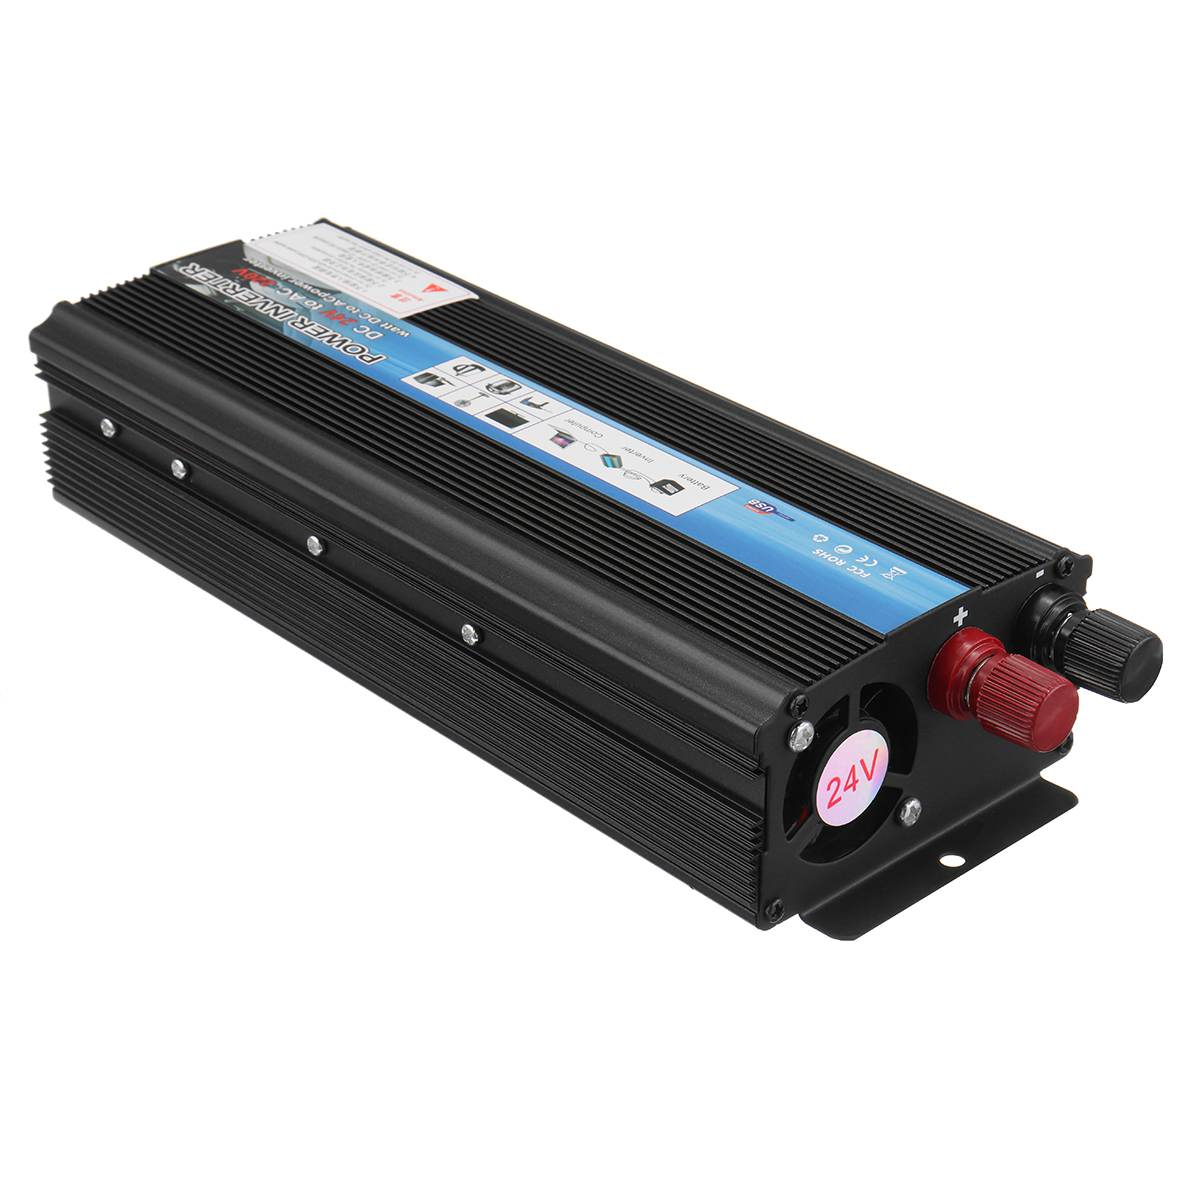 lowest price KROAK Car Inverter 12V 220V 5000W Pe ak Car Power Inverter Voltage Transformer Converter 12V To 220V Solar Inversor Black Style